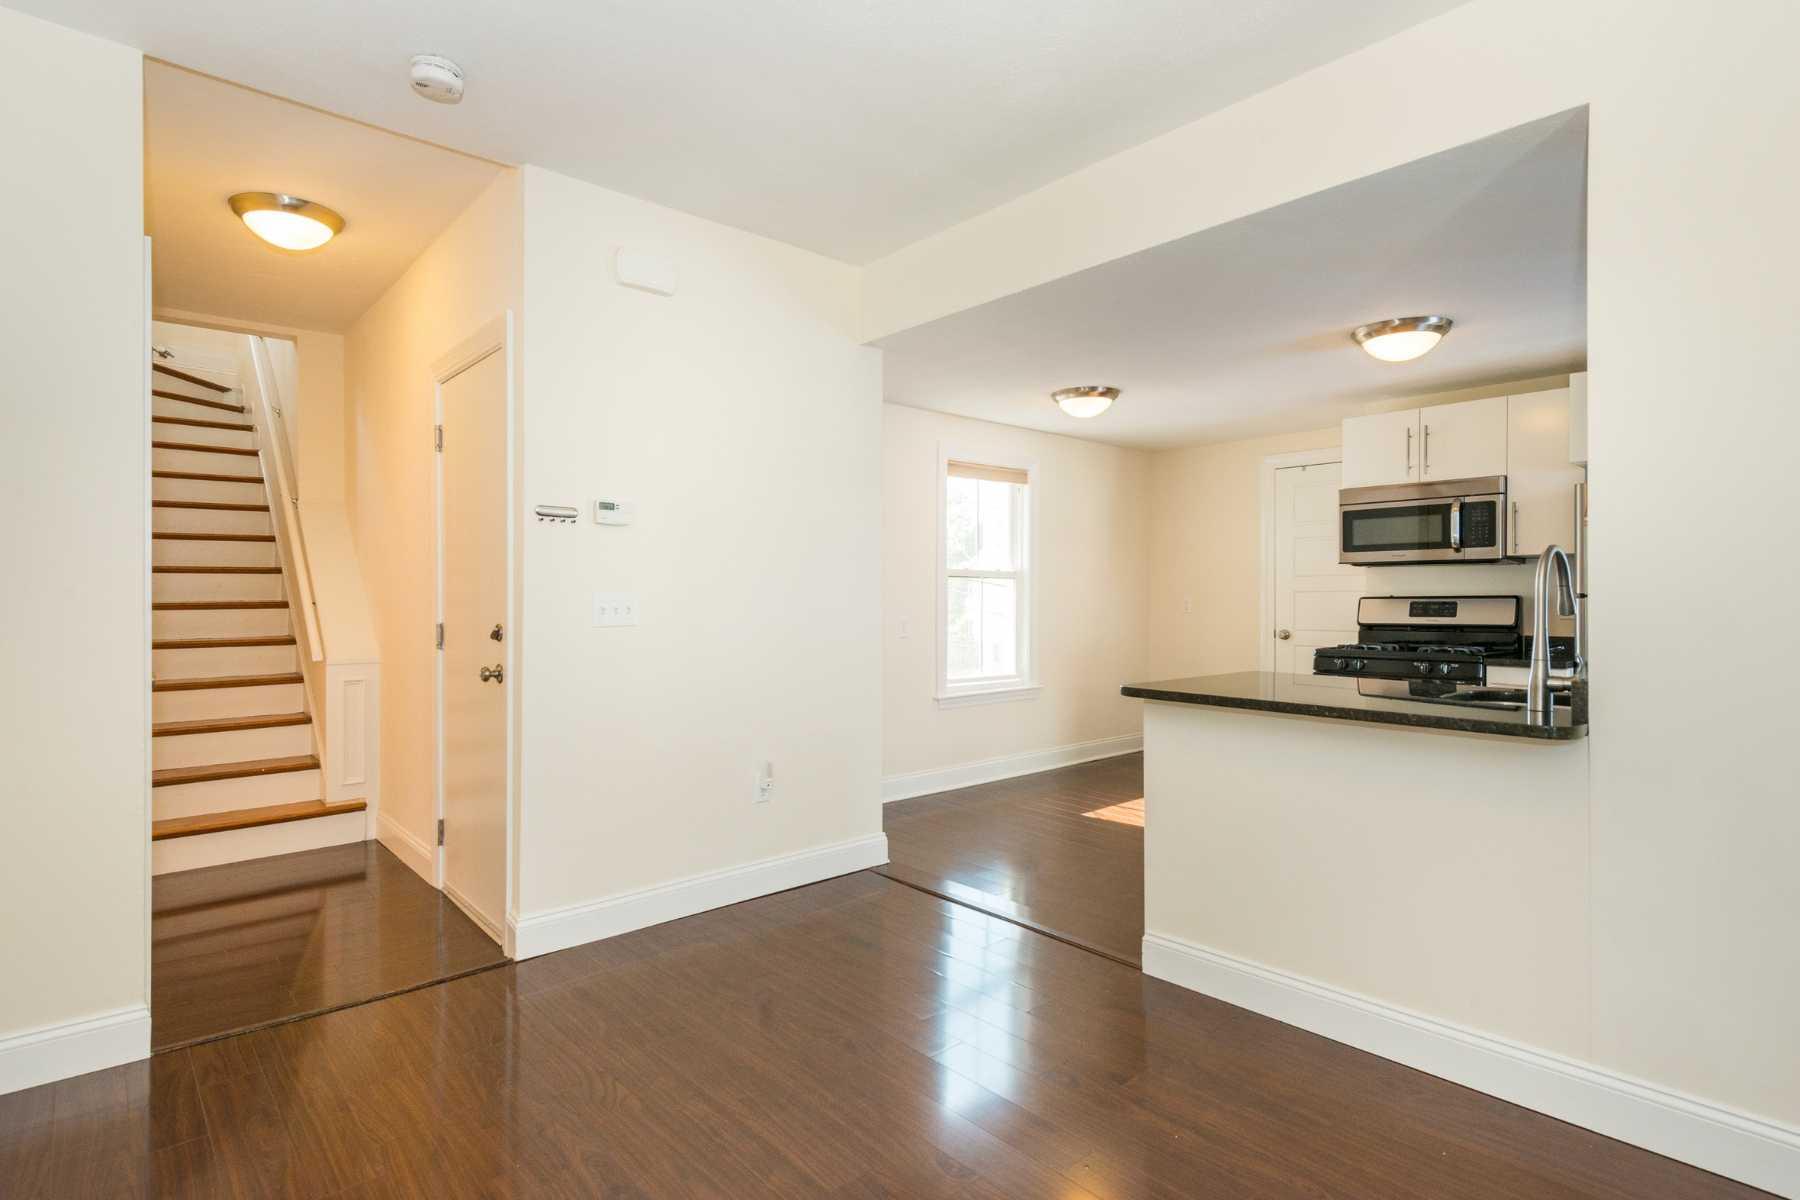 6-CapstoneCommunities-property-Dickinson-Street-Apartments-Somerville.jpg